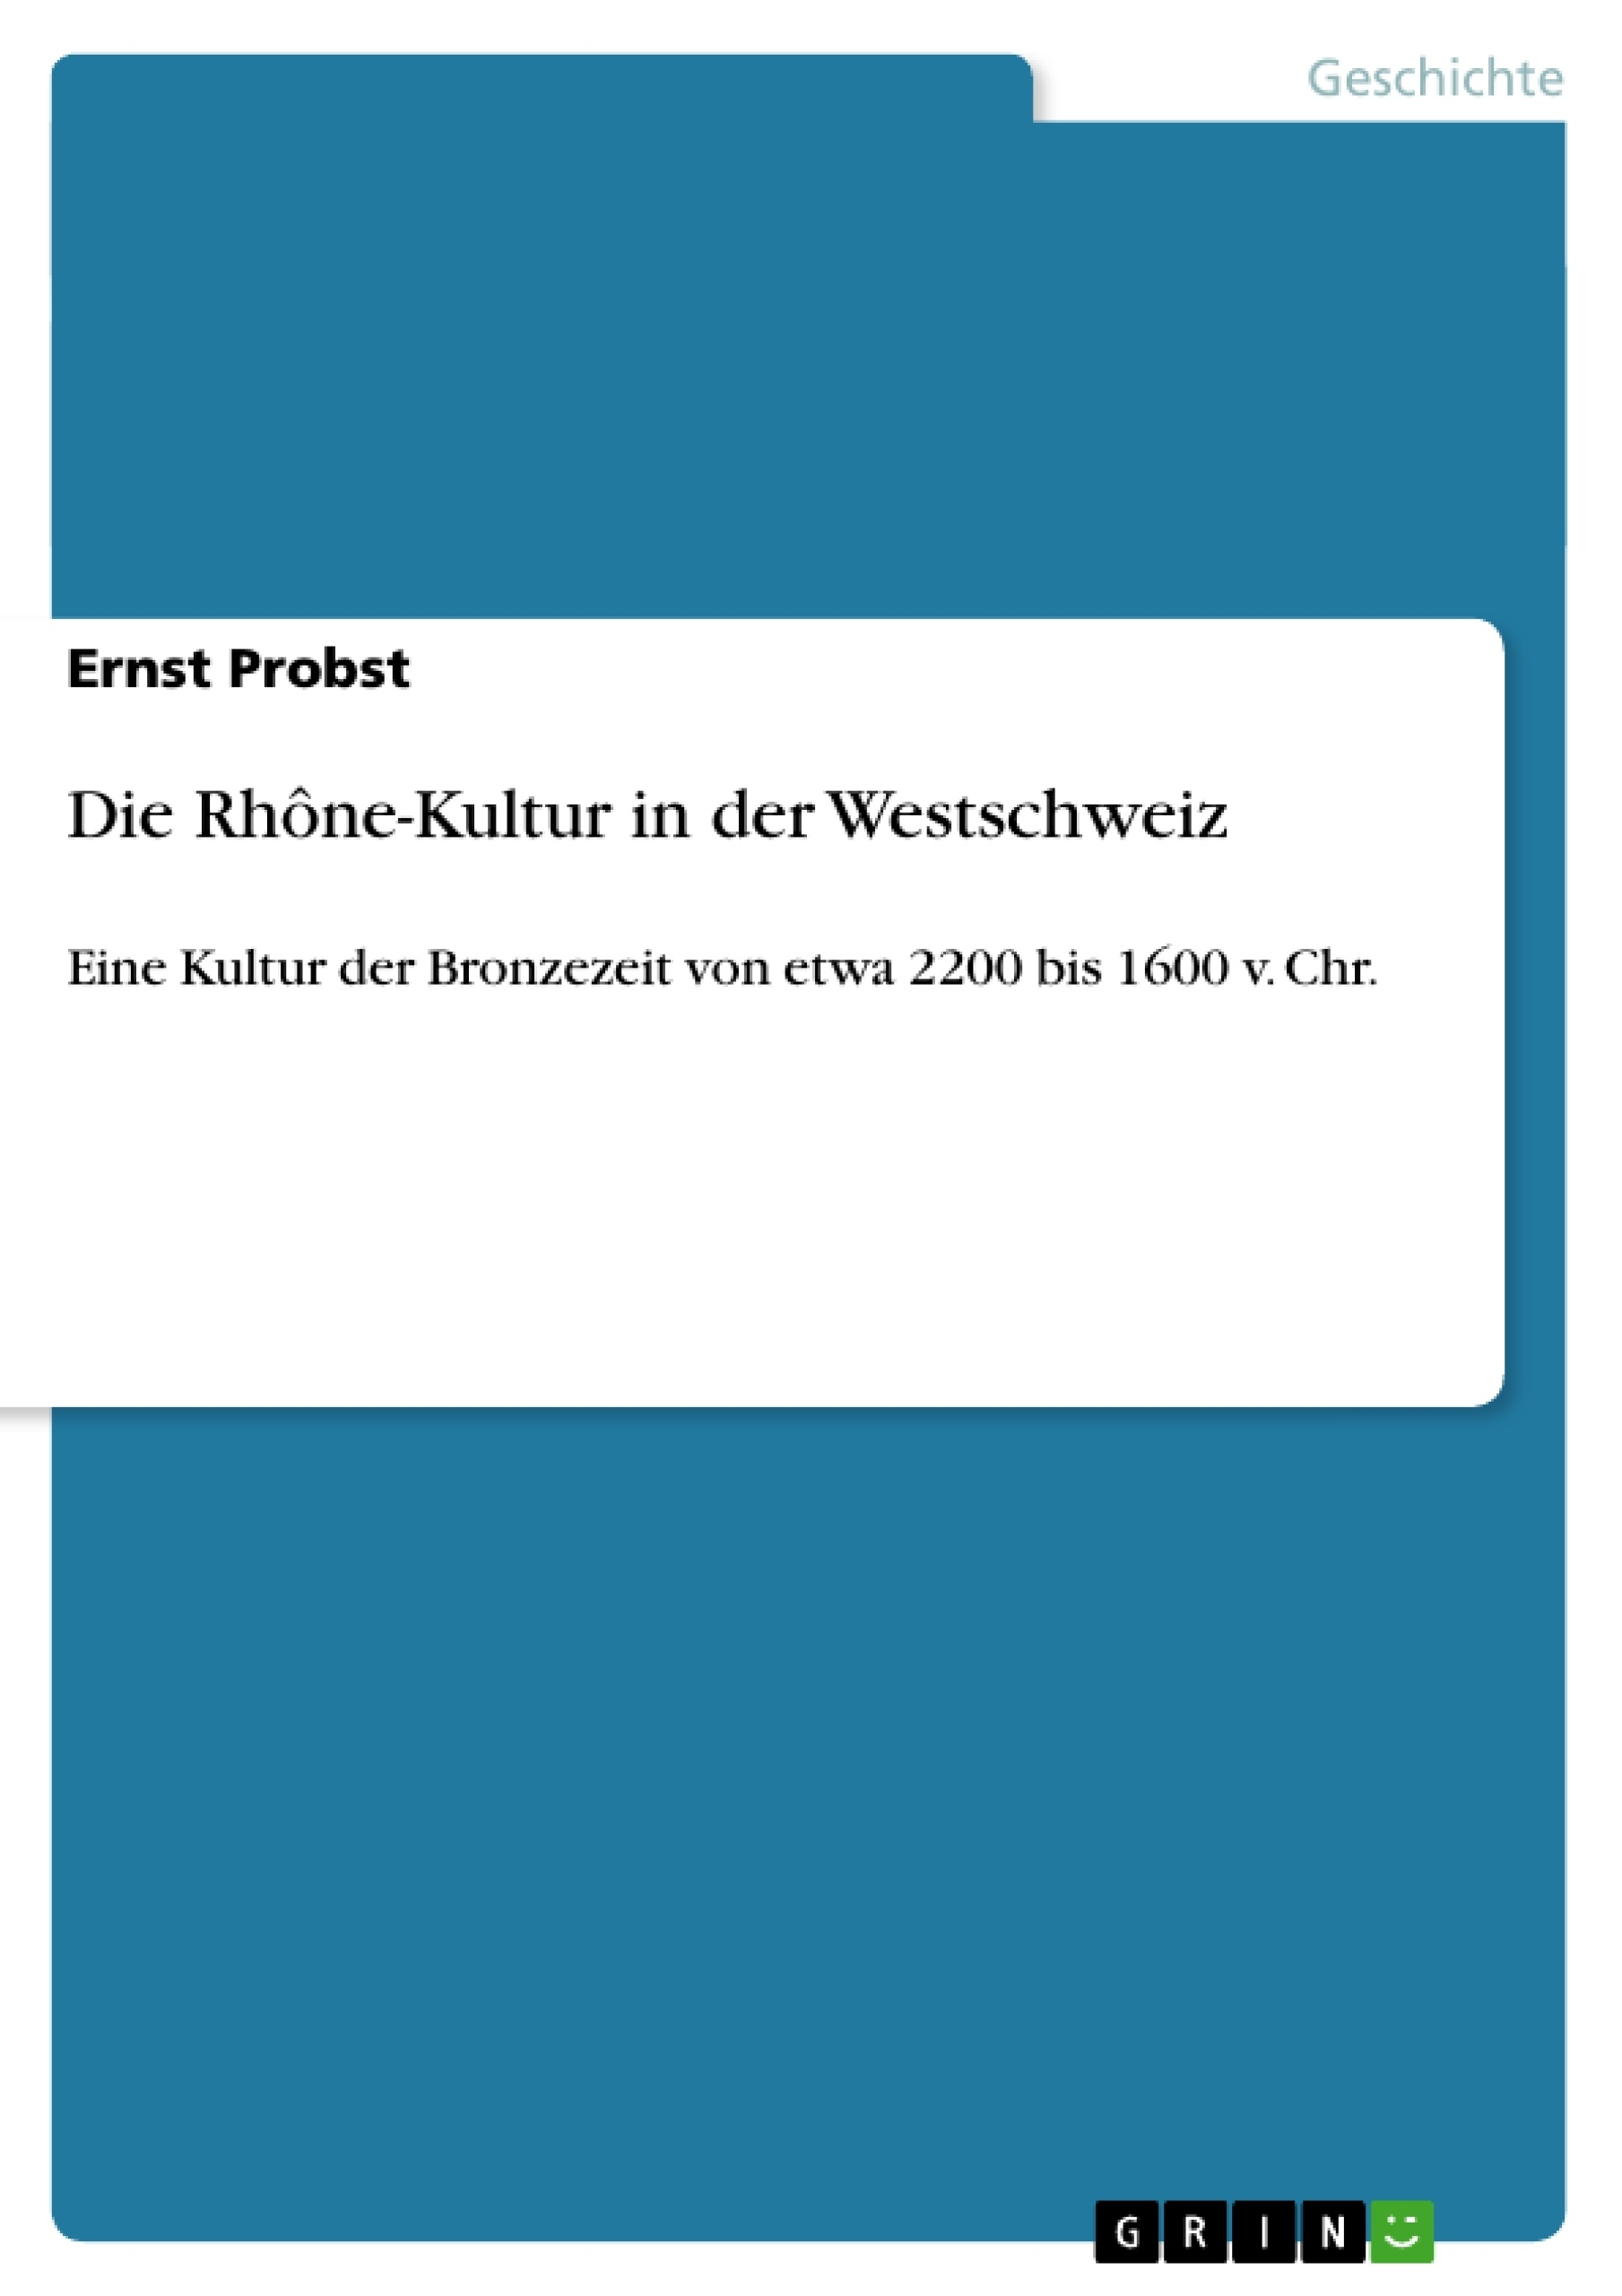 Titel: Die Rhône-Kultur in der Westschweiz